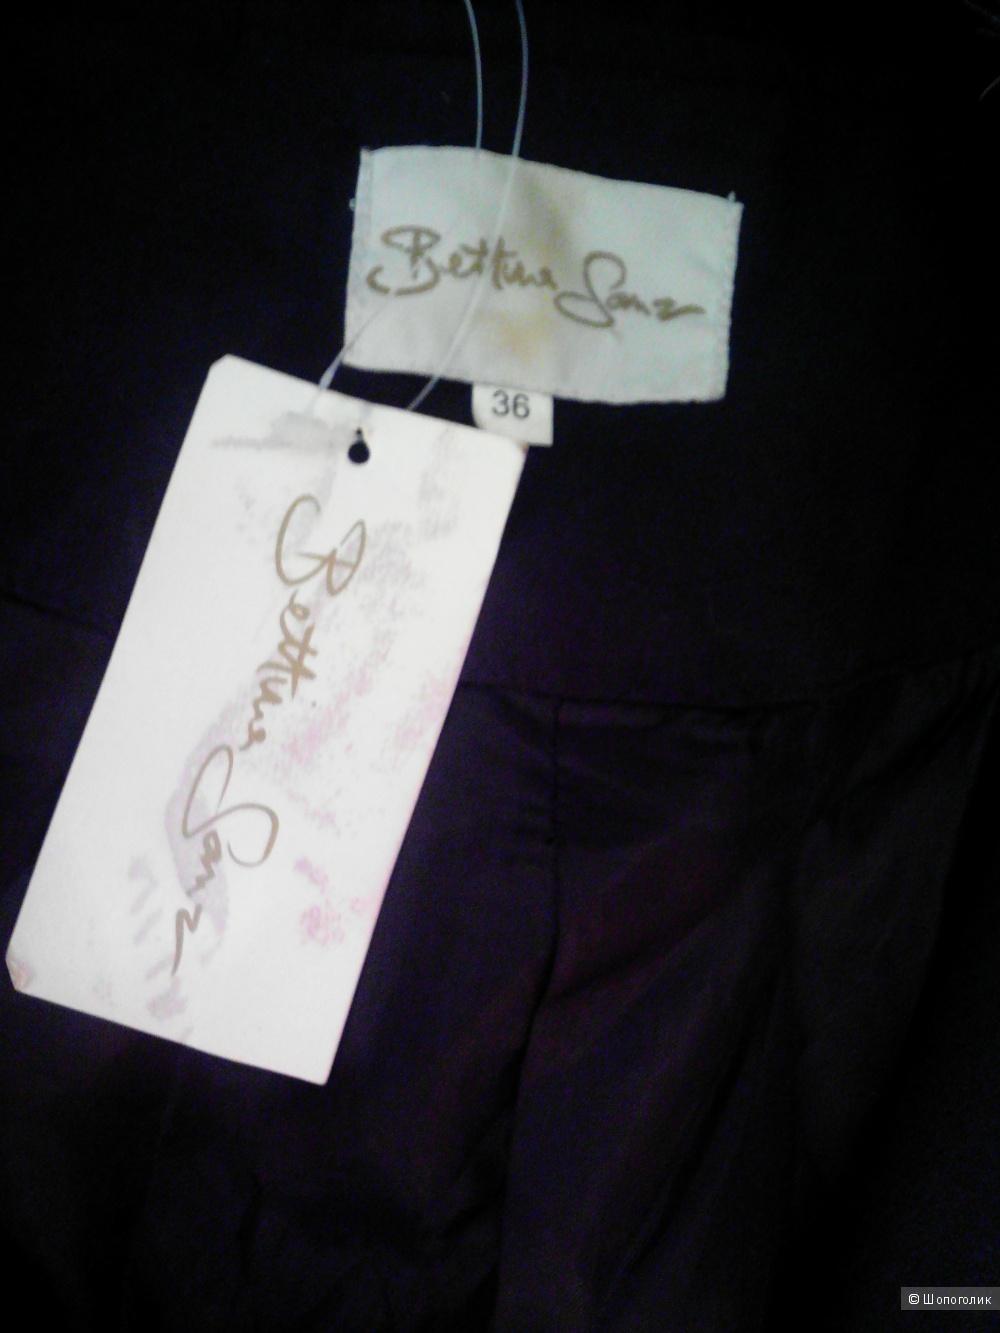 Пальто. Bettina Sanz. 36 (42-44)